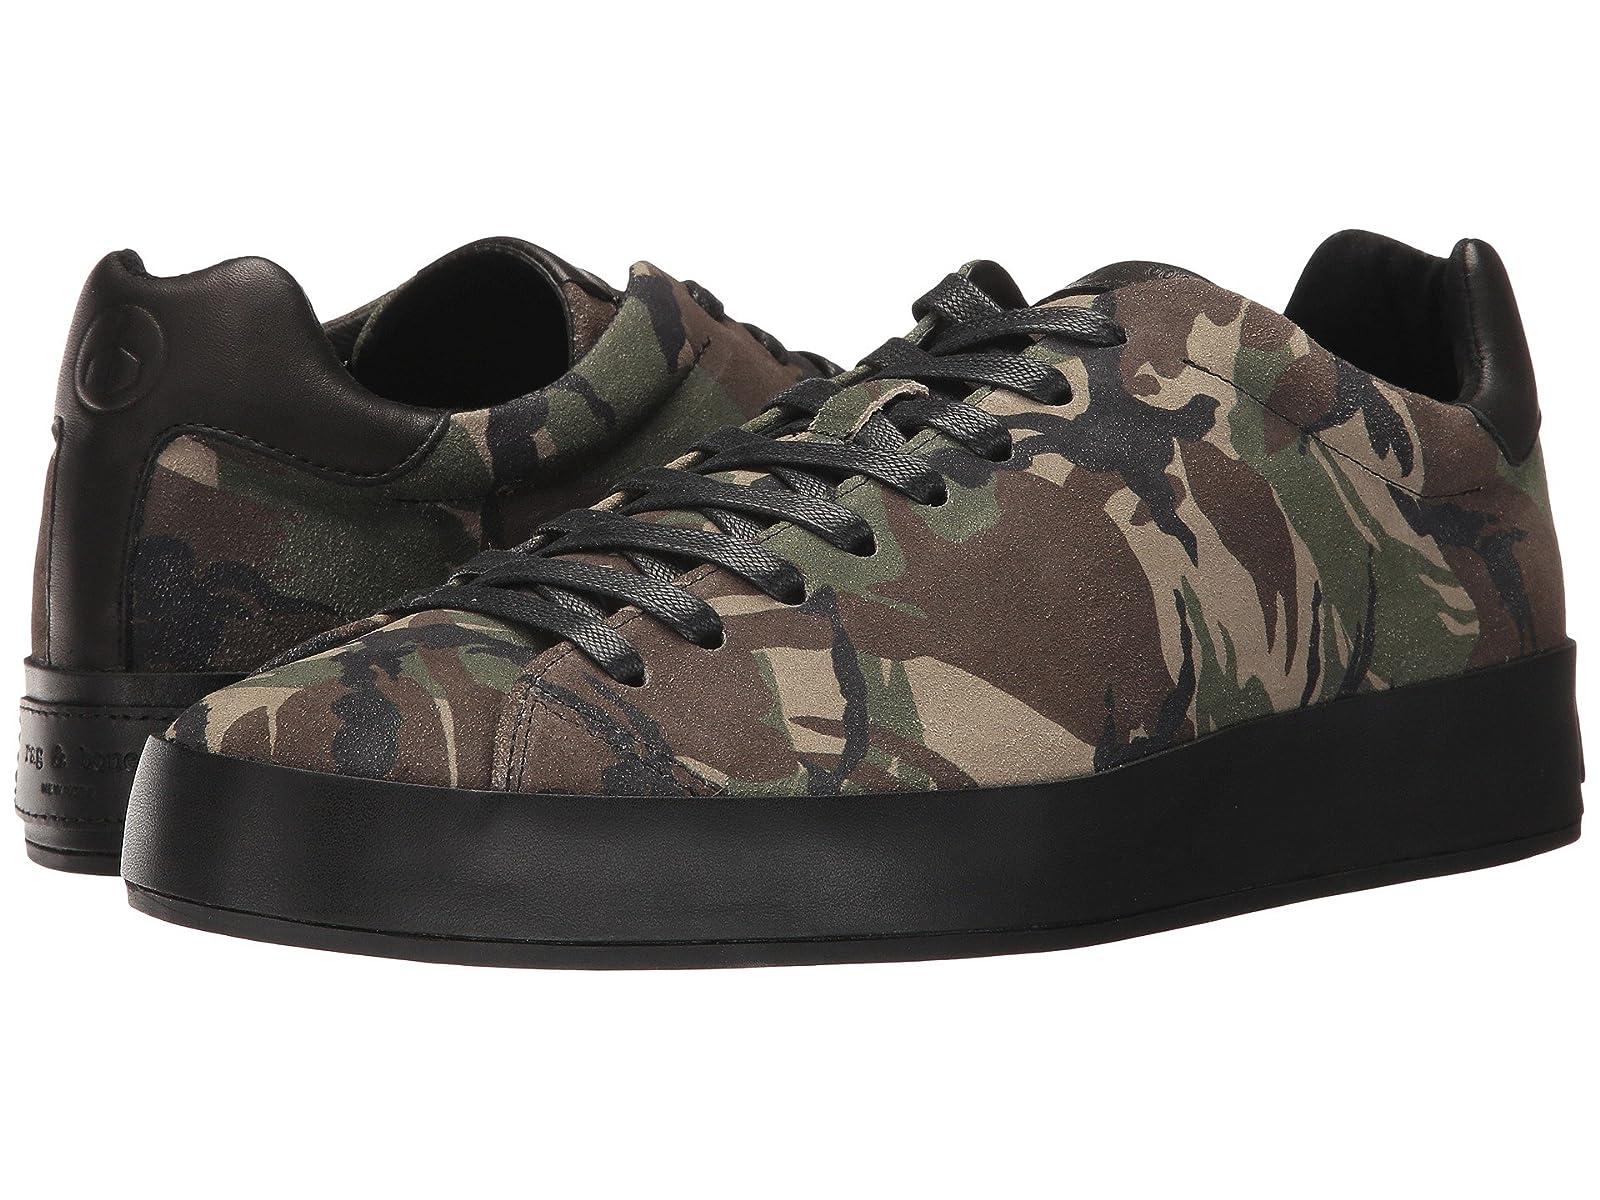 rag & bone RB1 LowCheap and distinctive eye-catching shoes